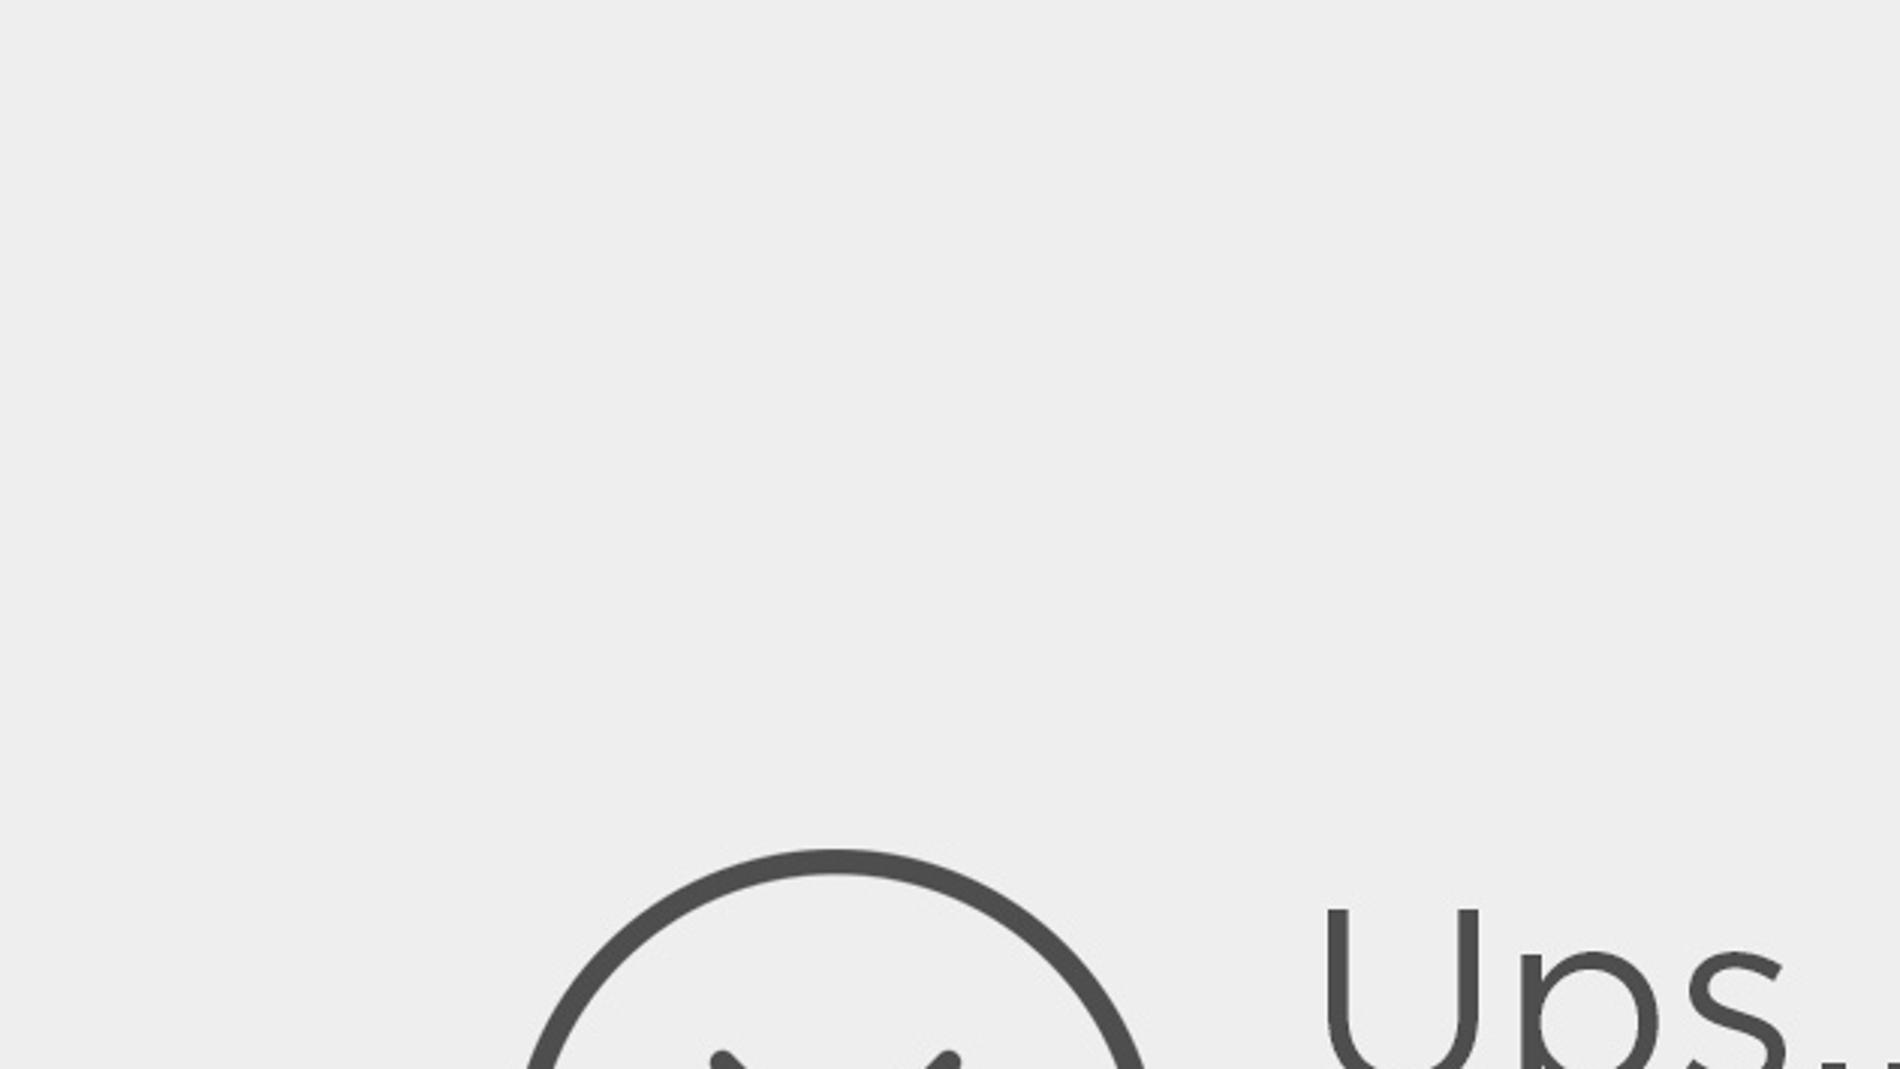 Primera imagen de Jared Leto como Joker en homenaje a The Killing Joke